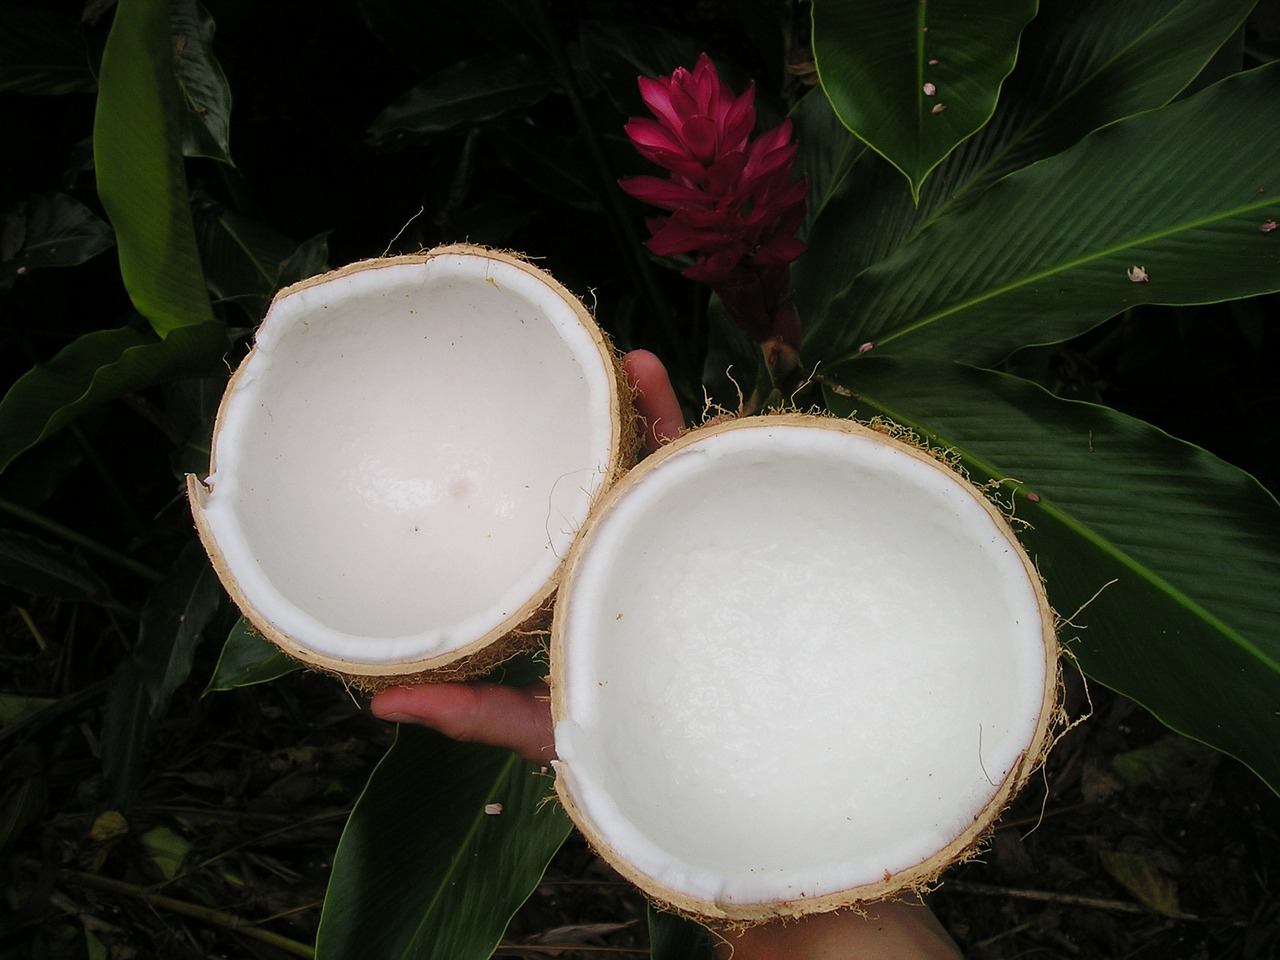 coconut-43_1280